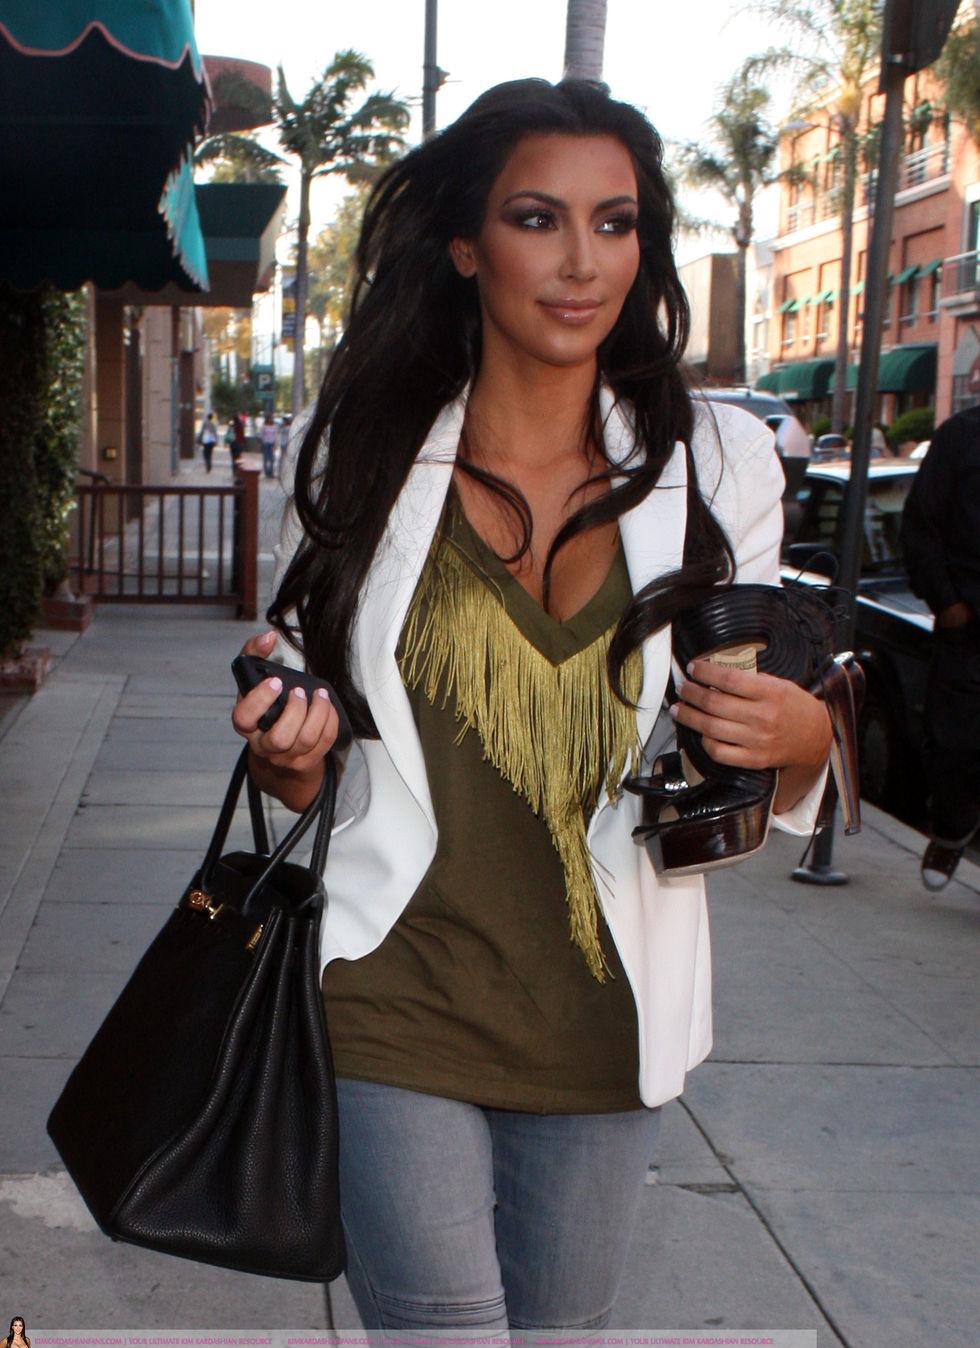 Kim Kardashian 2010 : kim-kardashian-at-lax-airport-in-beverly-hills-13